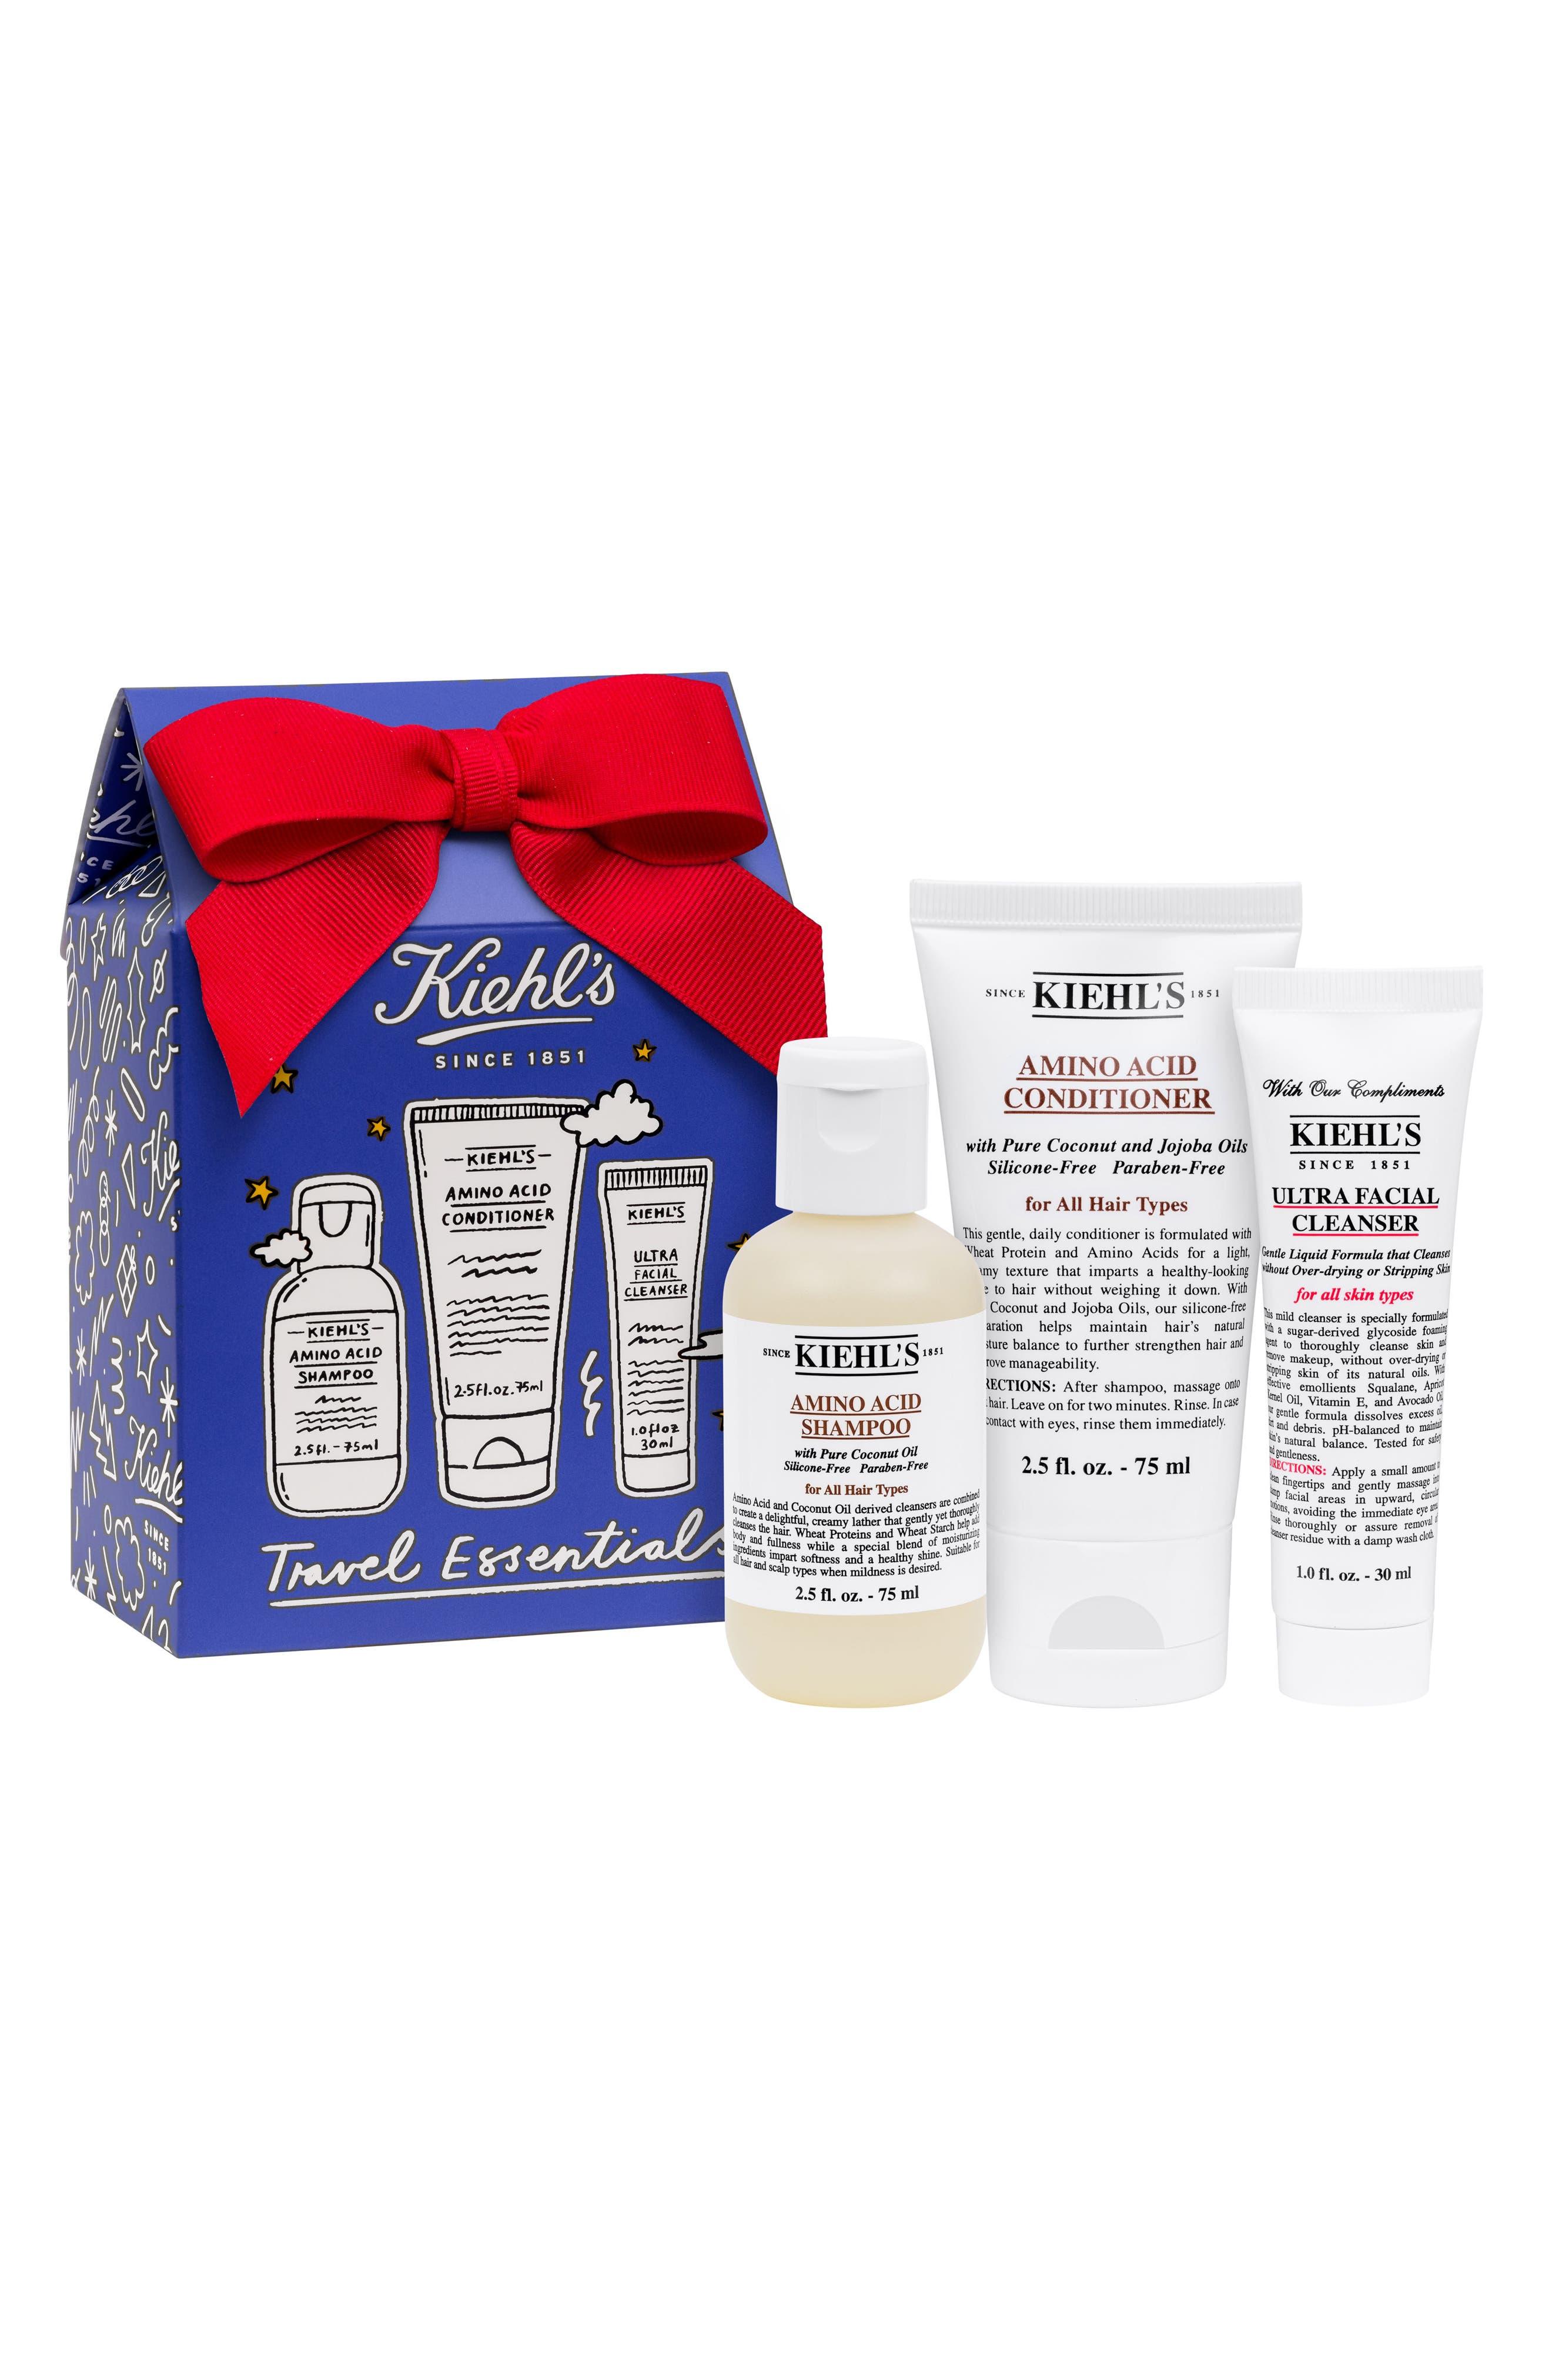 Main Image - Kiehl's Since 1851 Travel Essentials Set ($18 Value)